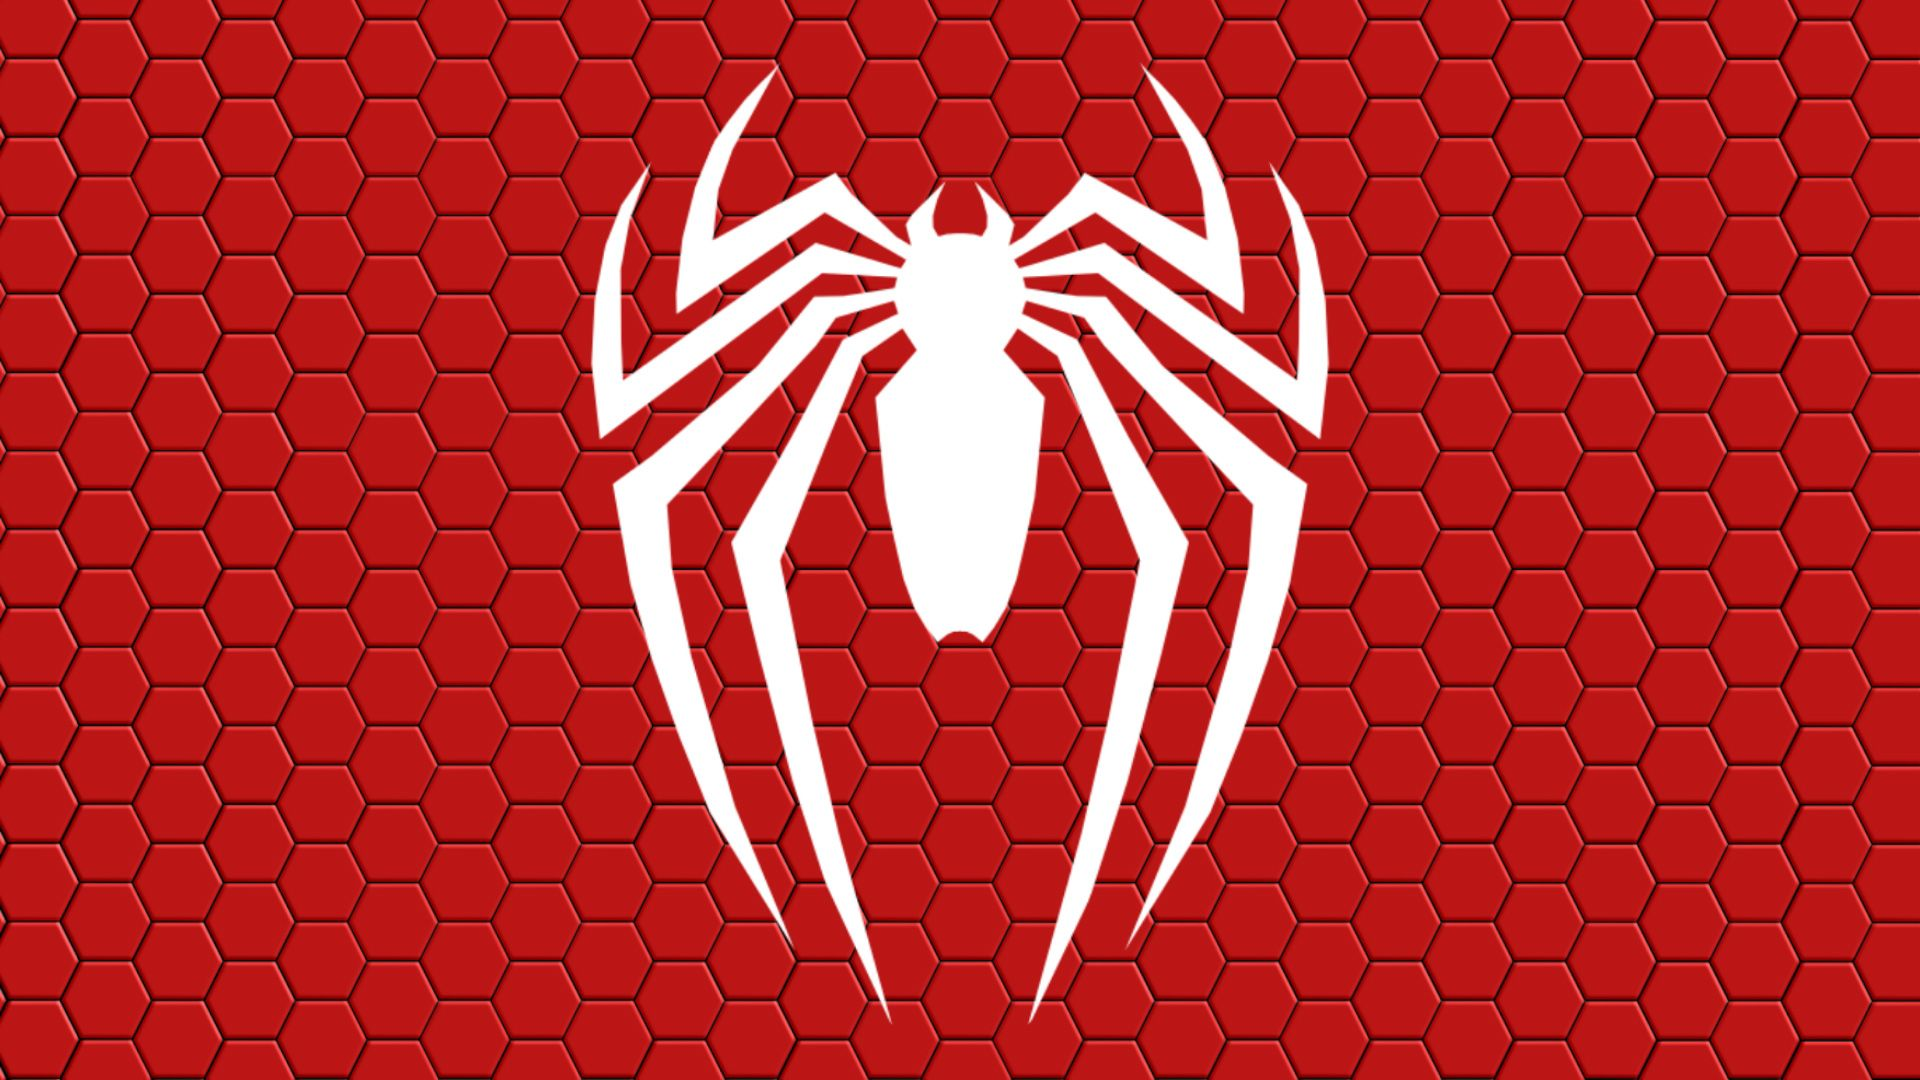 Marvel Spiderman Logo Wallpapers.